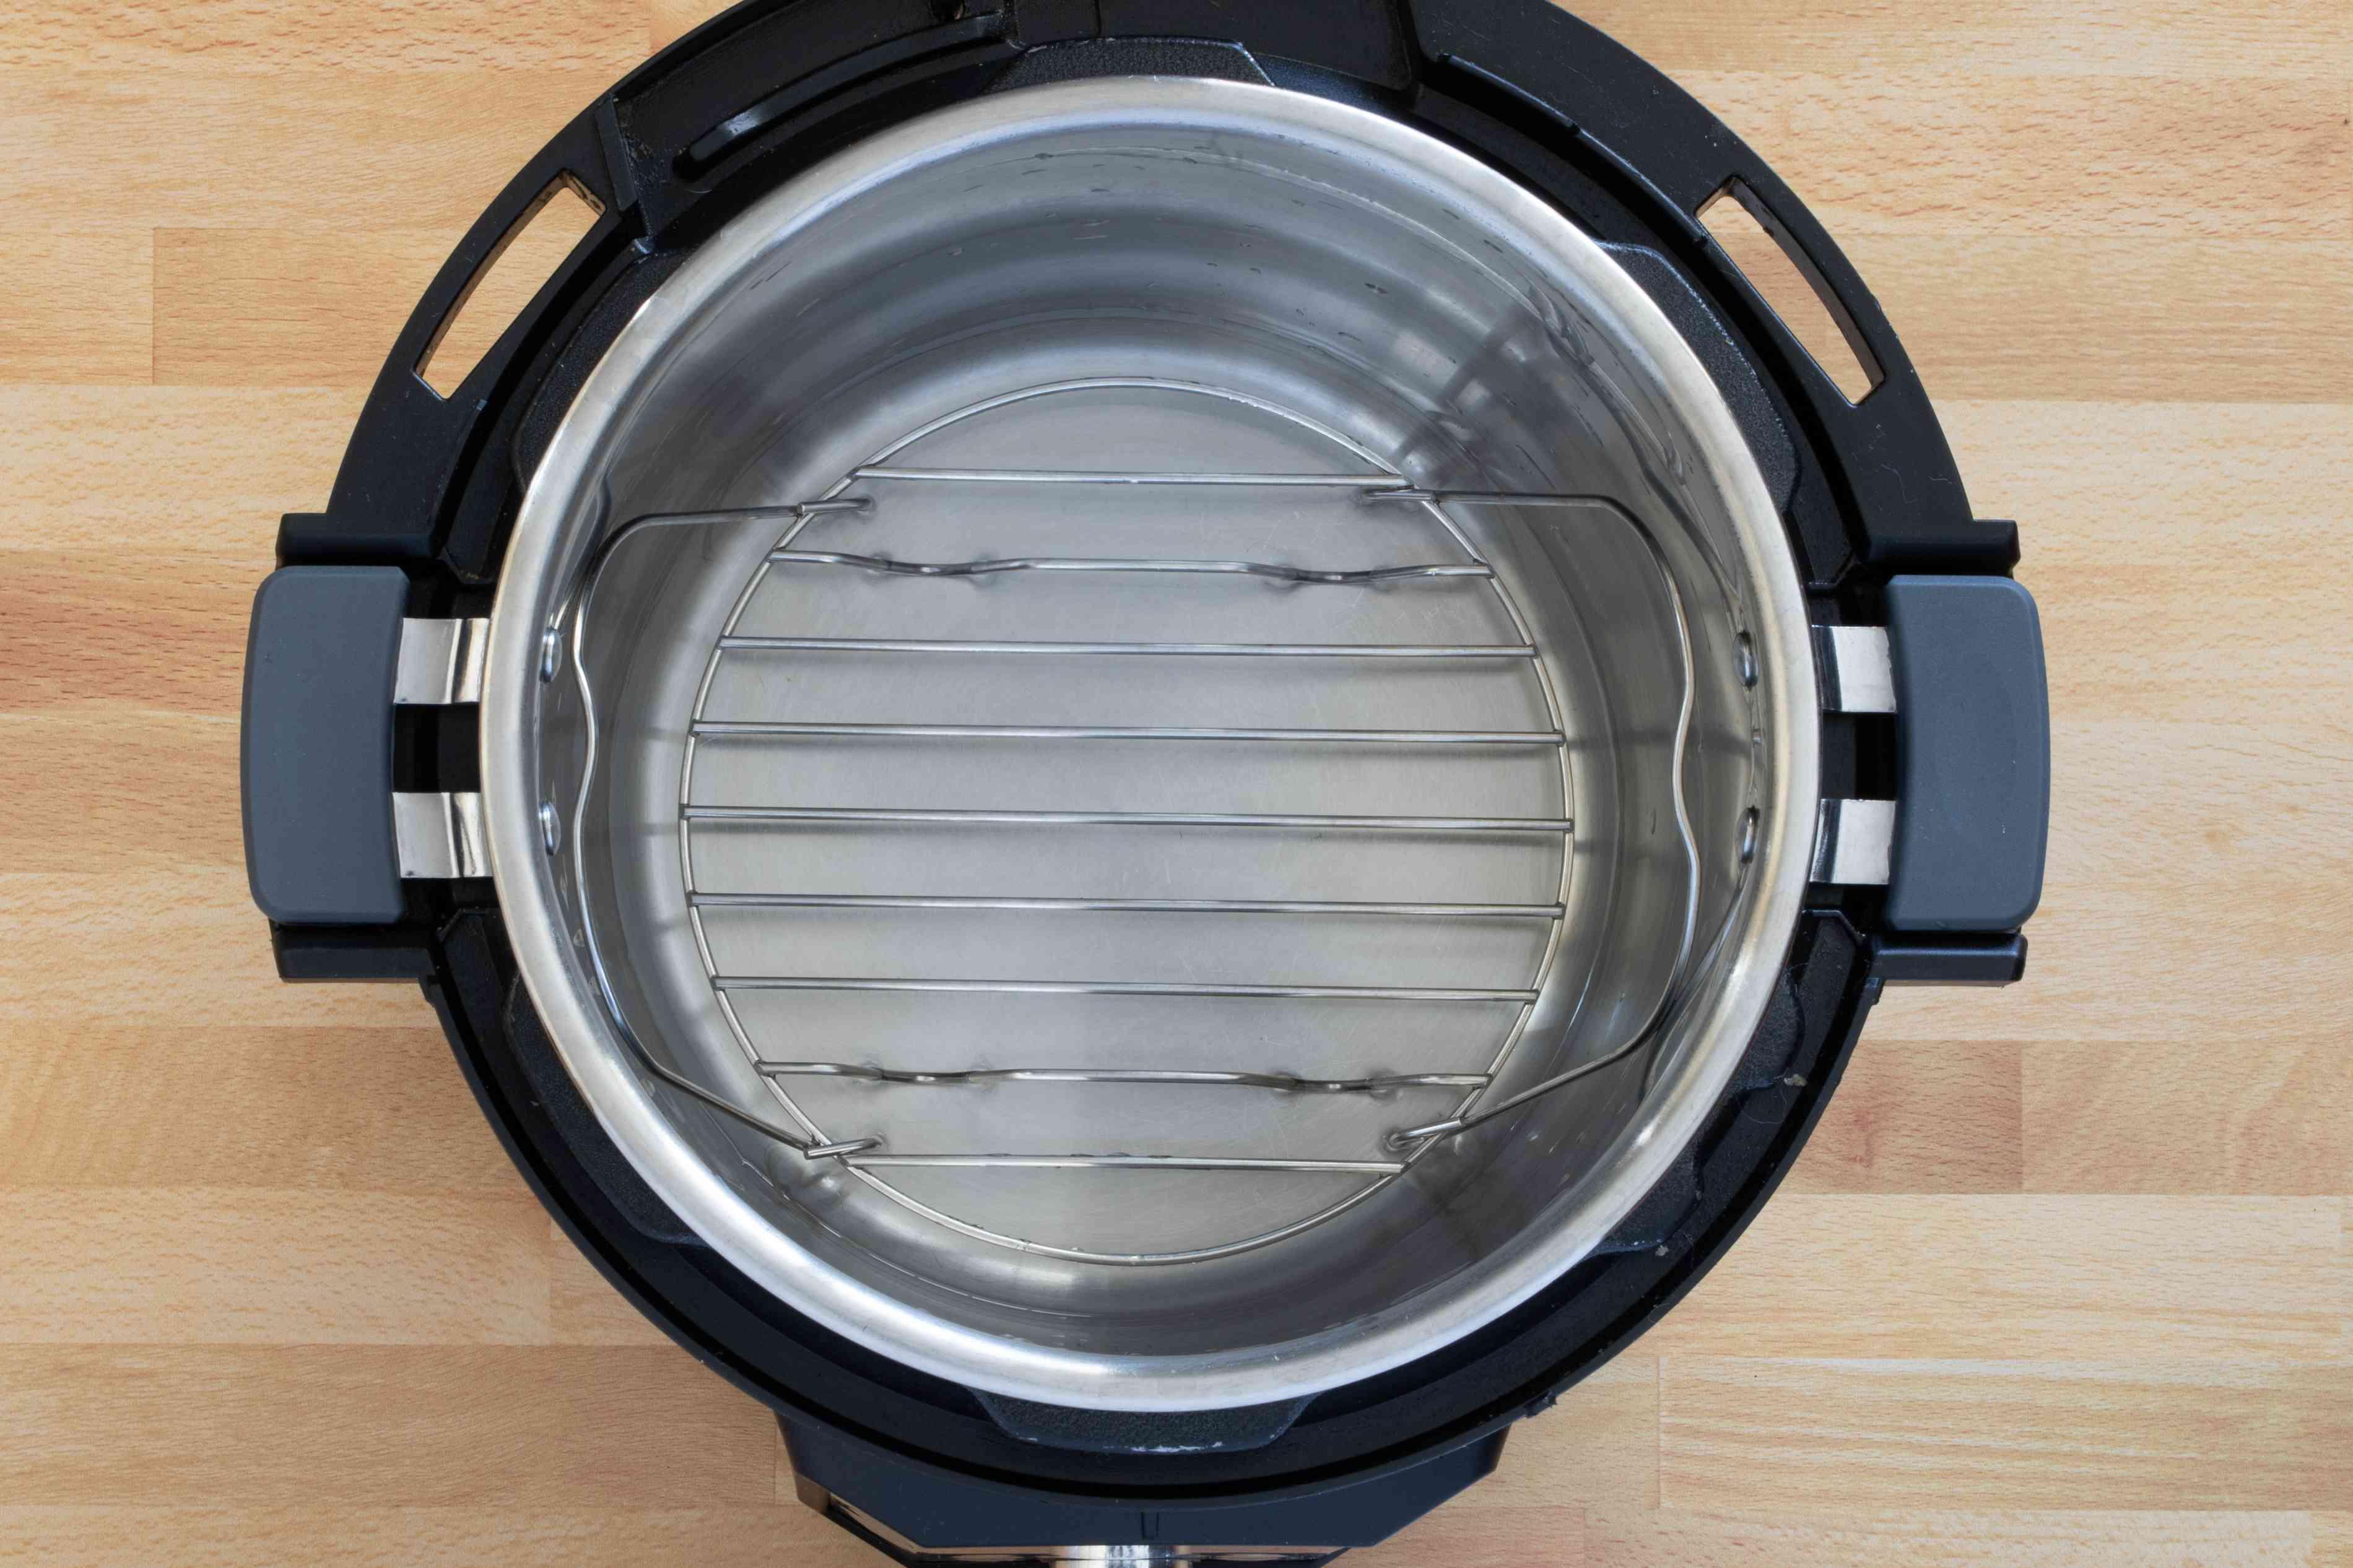 rack in the instant pot